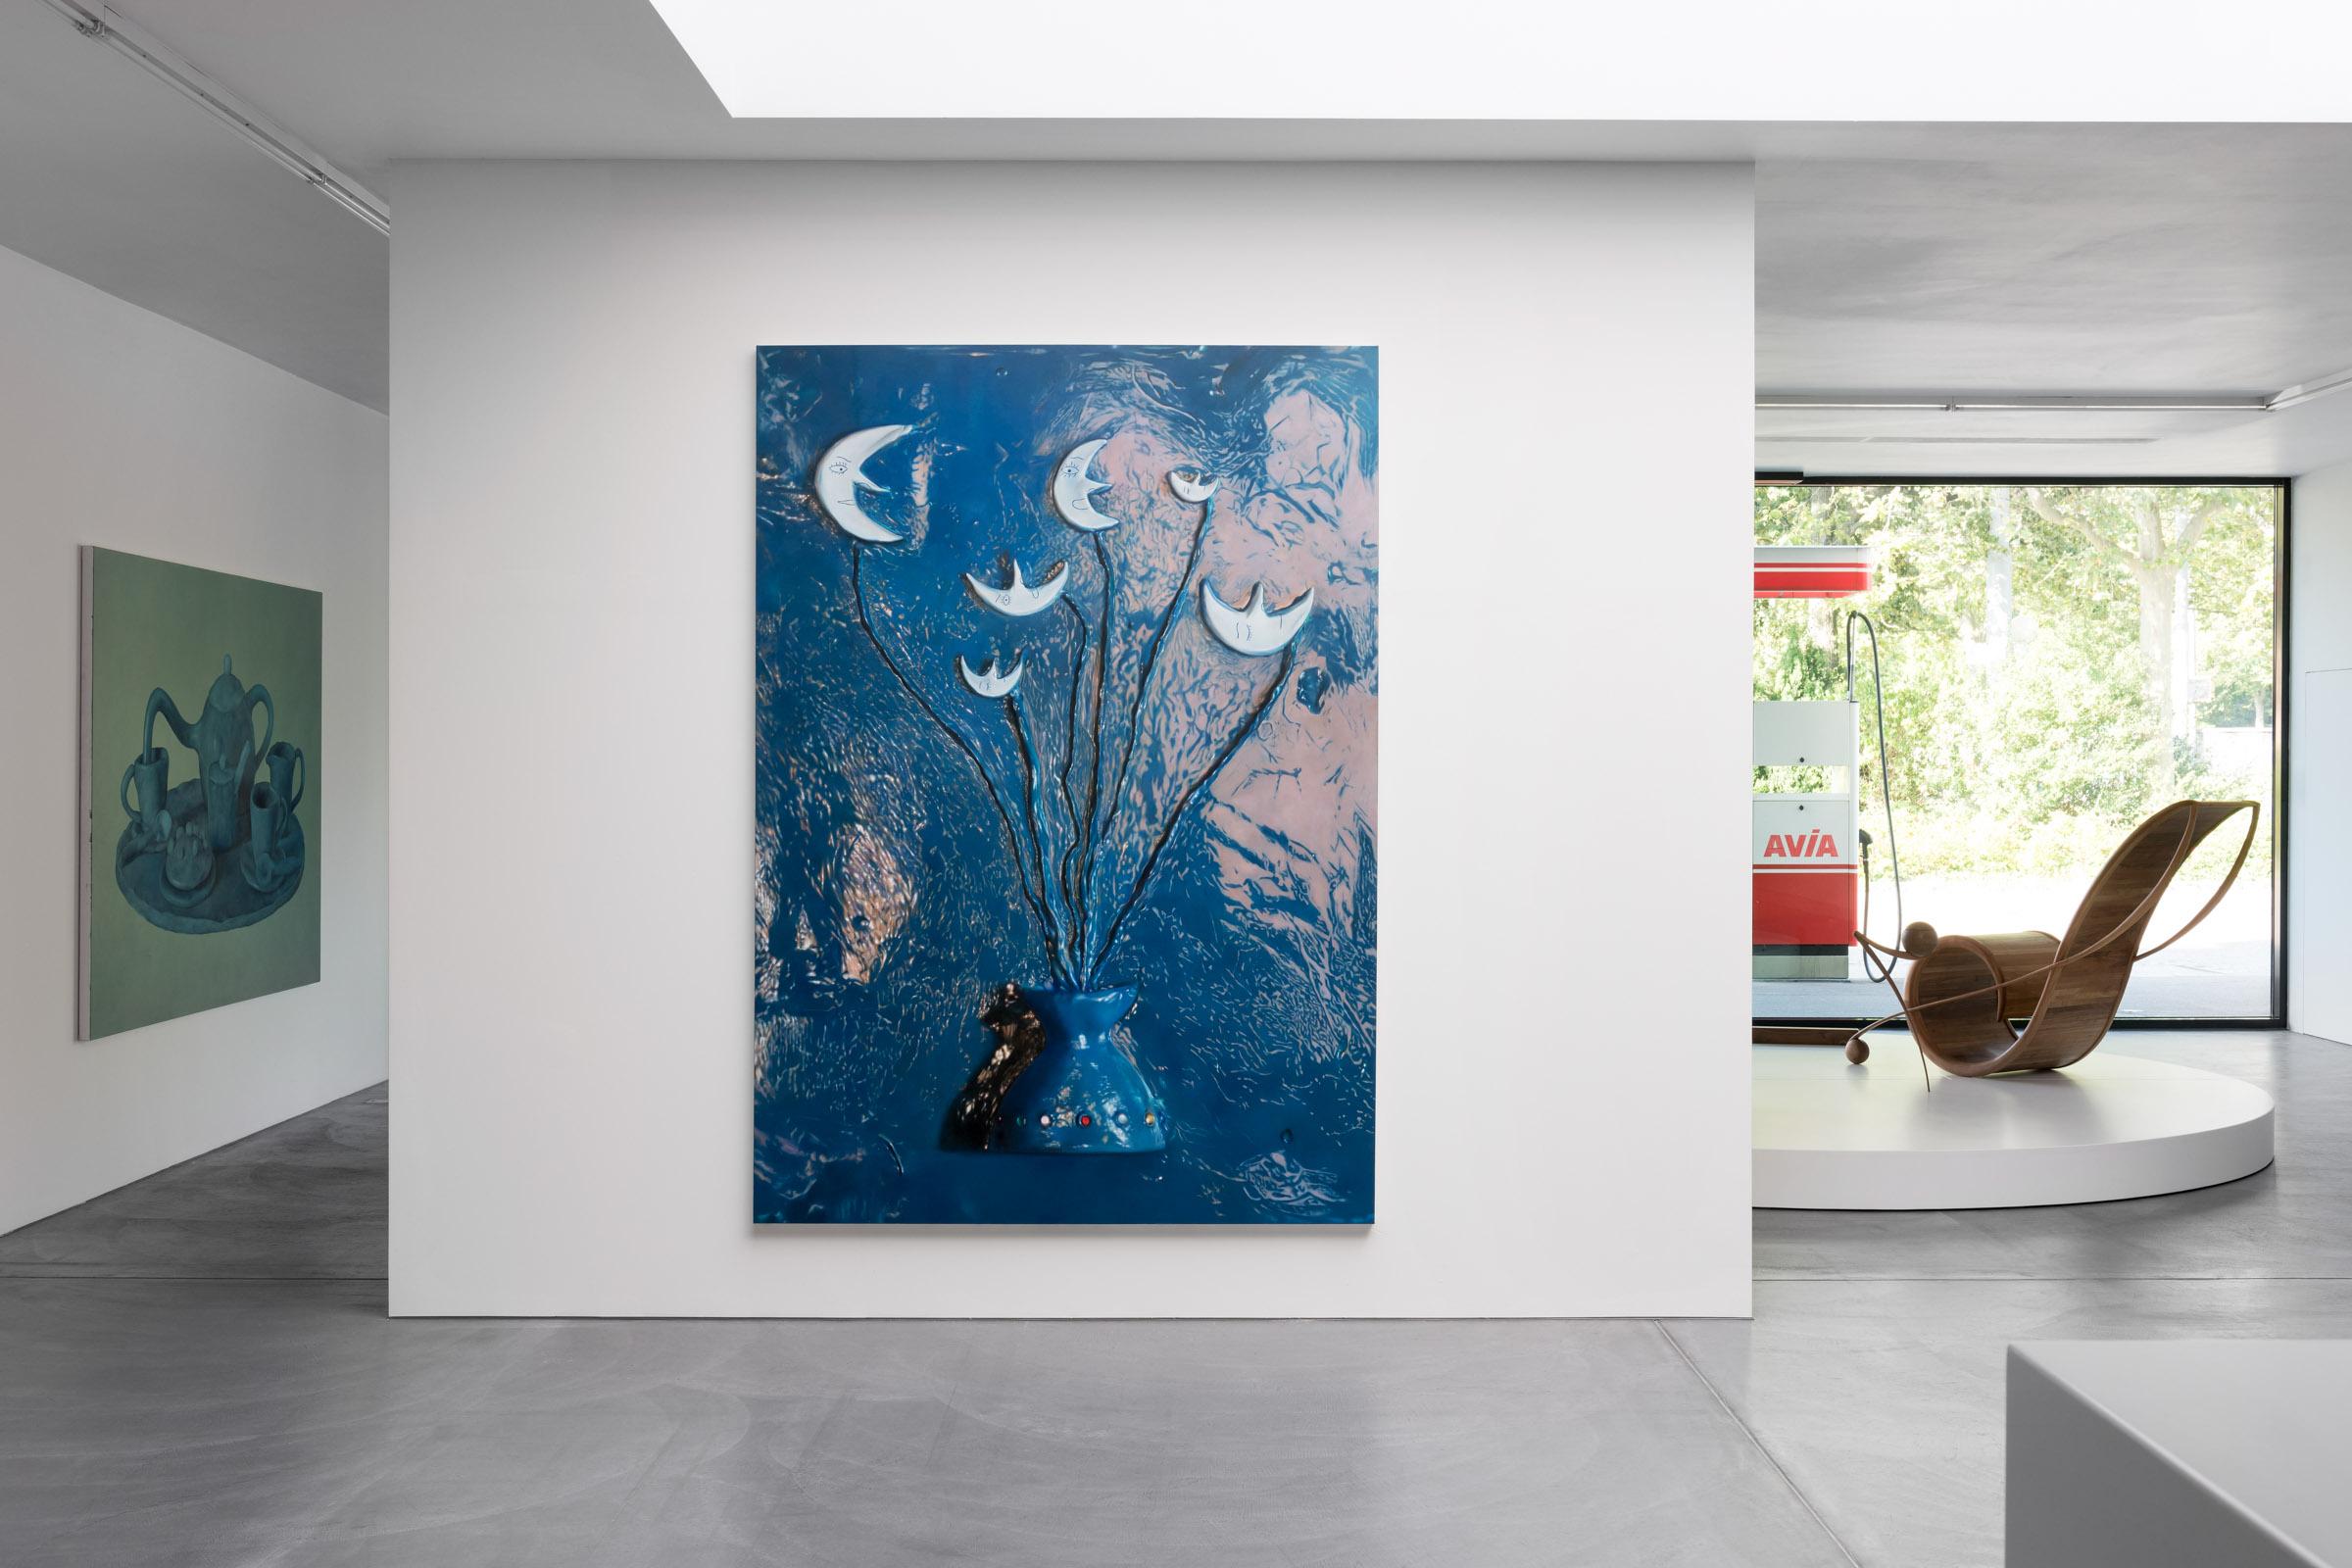 Exhibition: Francisco Sierra